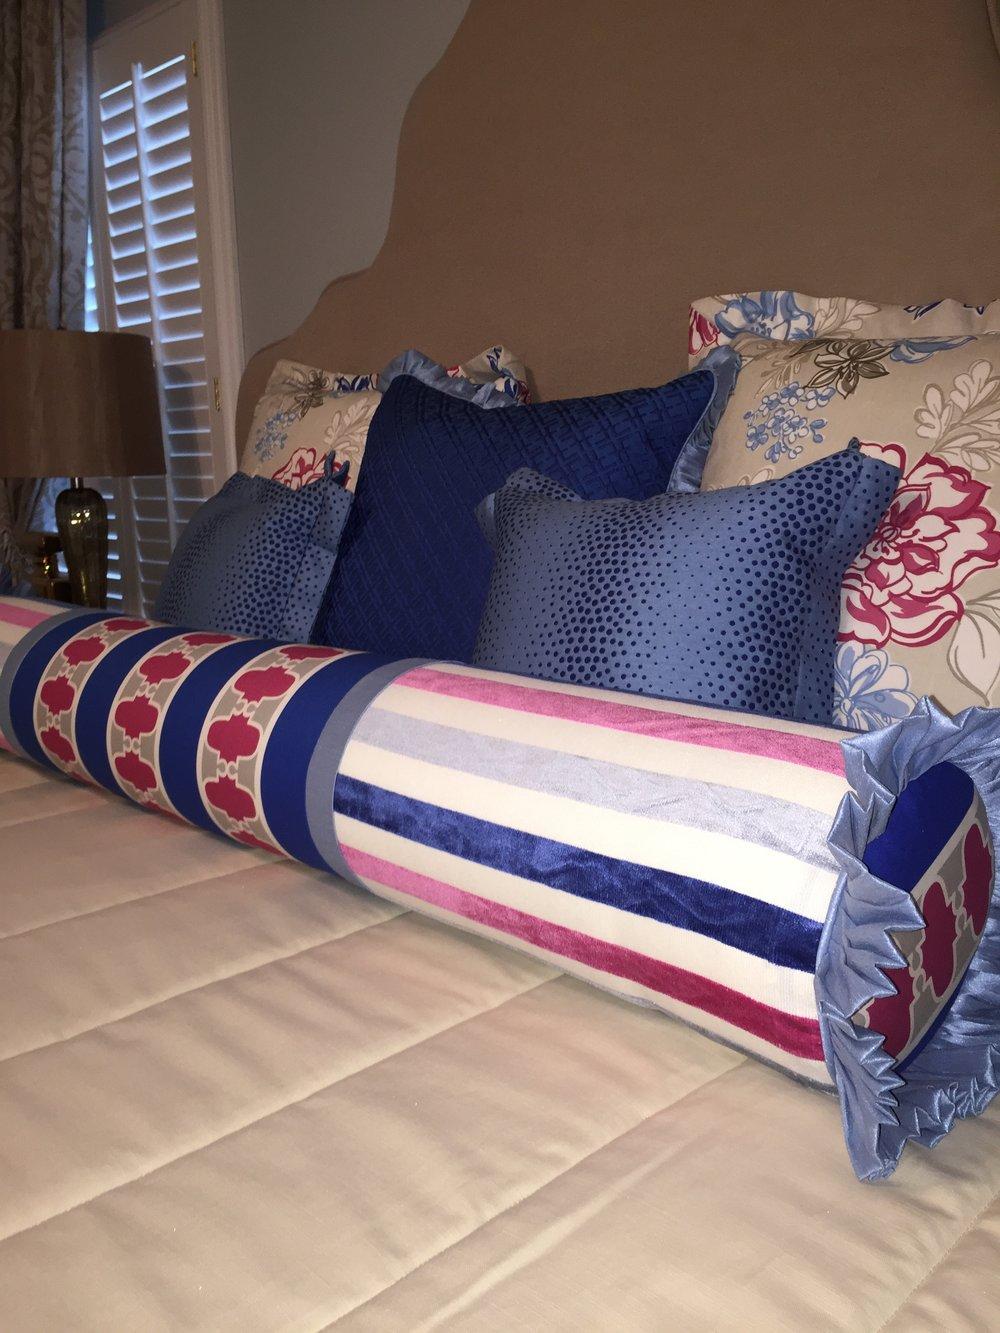 Canali Drapery Studio Custom Design Luxury Bedding and Pillows (36).JPG